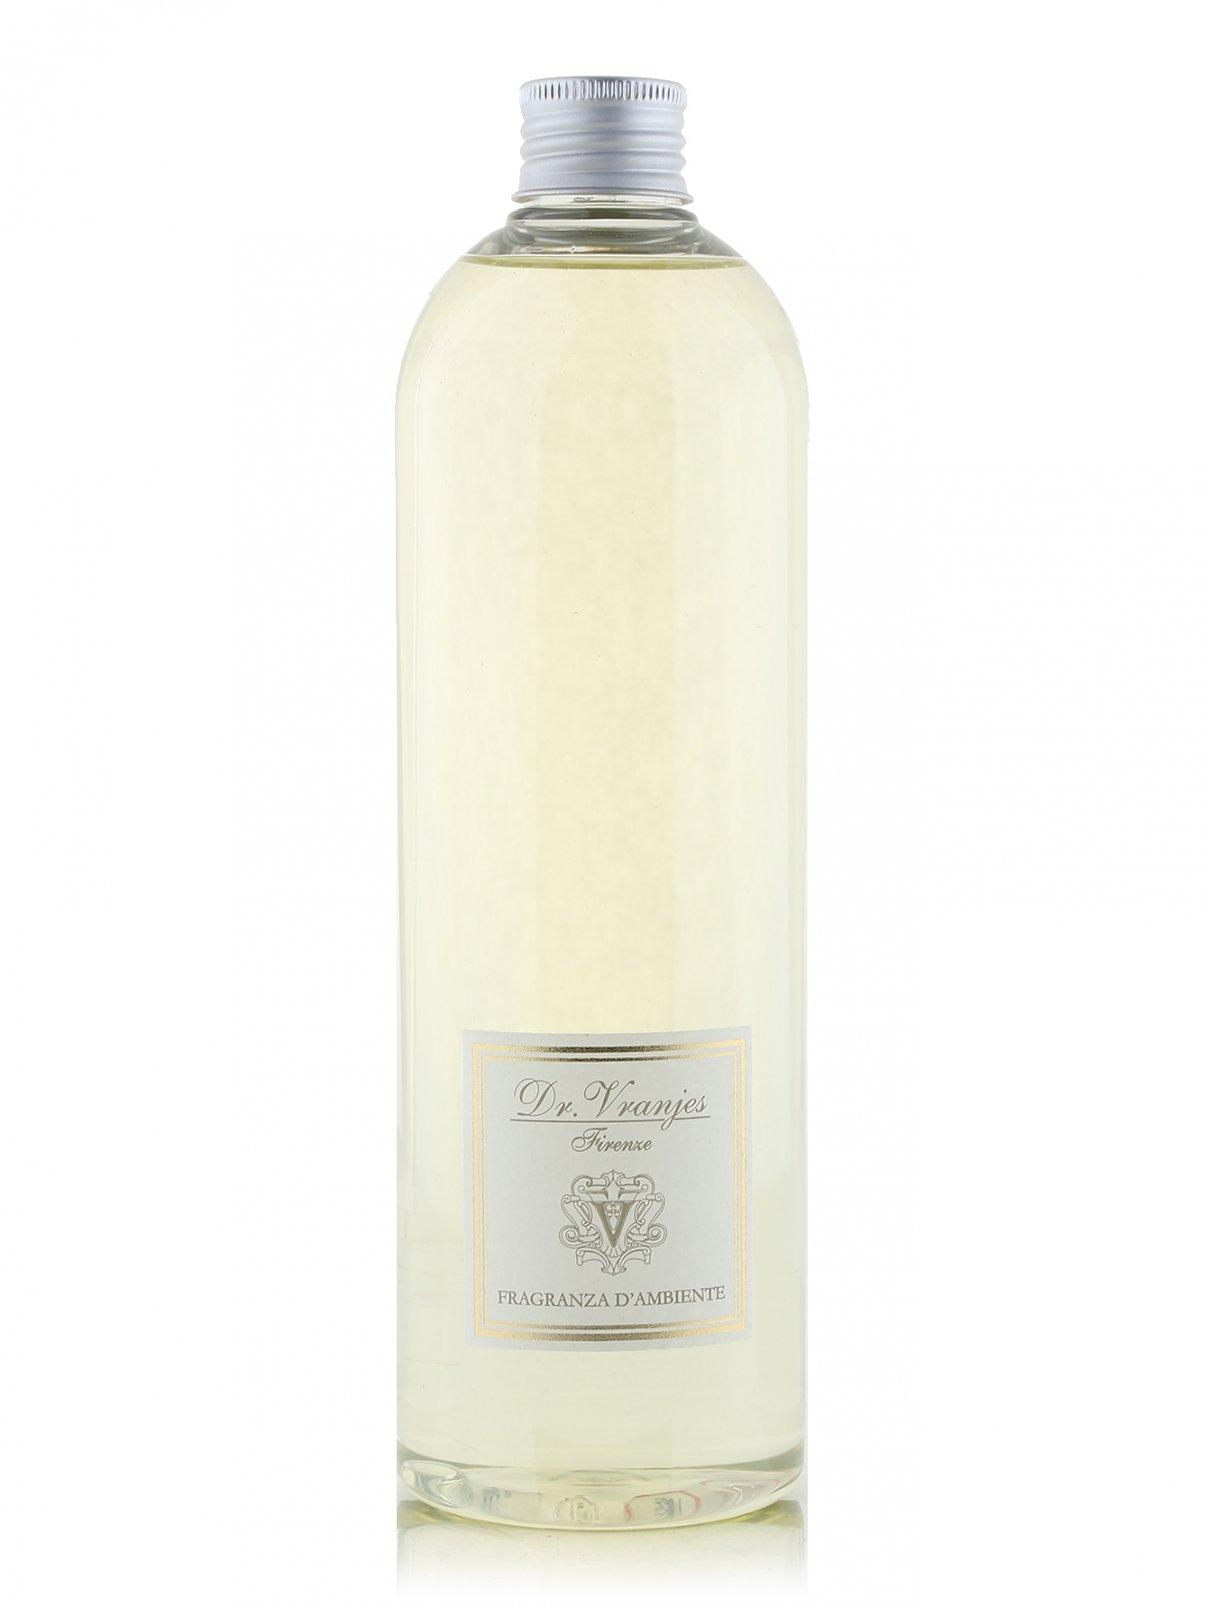 Наполнитель для диффузора - Ginger & Lime, Home Fragrance, 500ml Dr. Vranjes  –  Общий вид